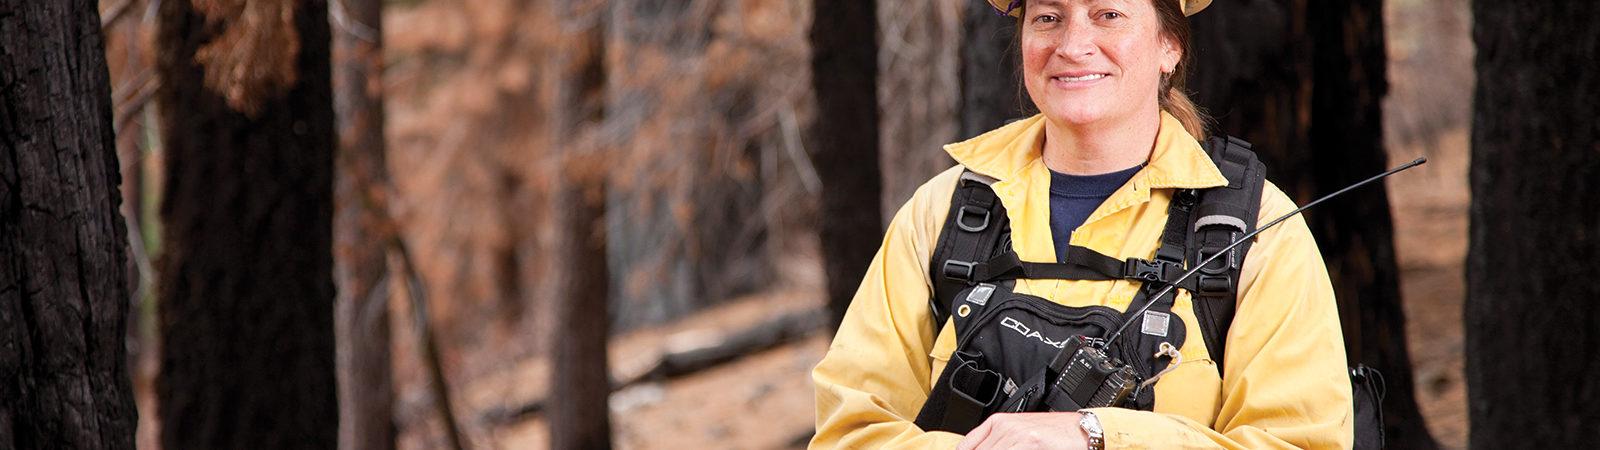 Alumna wilderness fire chief